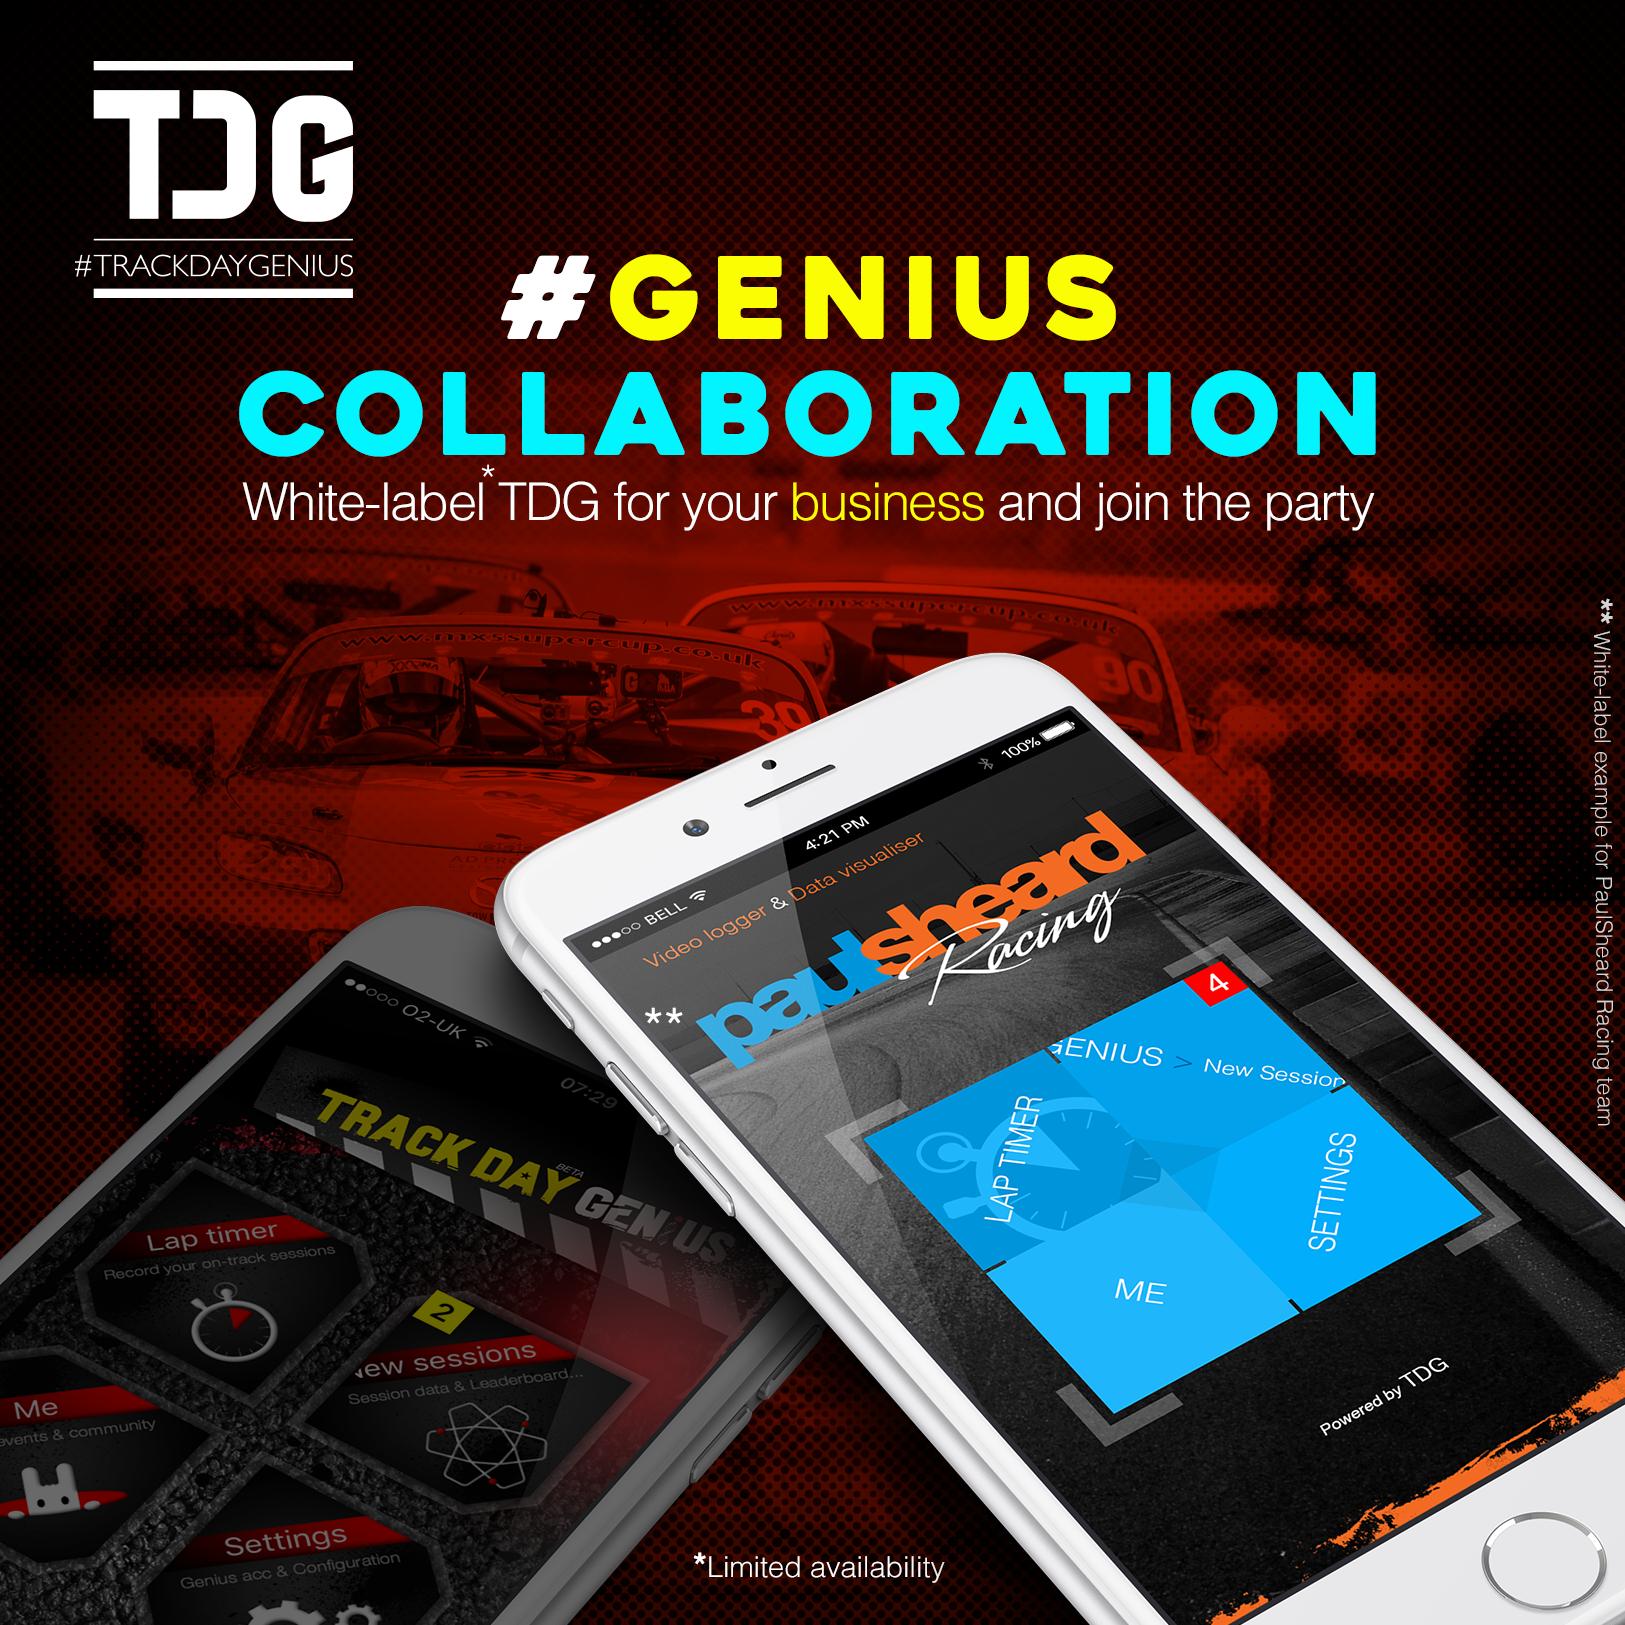 tdg-hashTag-geniusCollaborationwhiteLabel-v5-sq